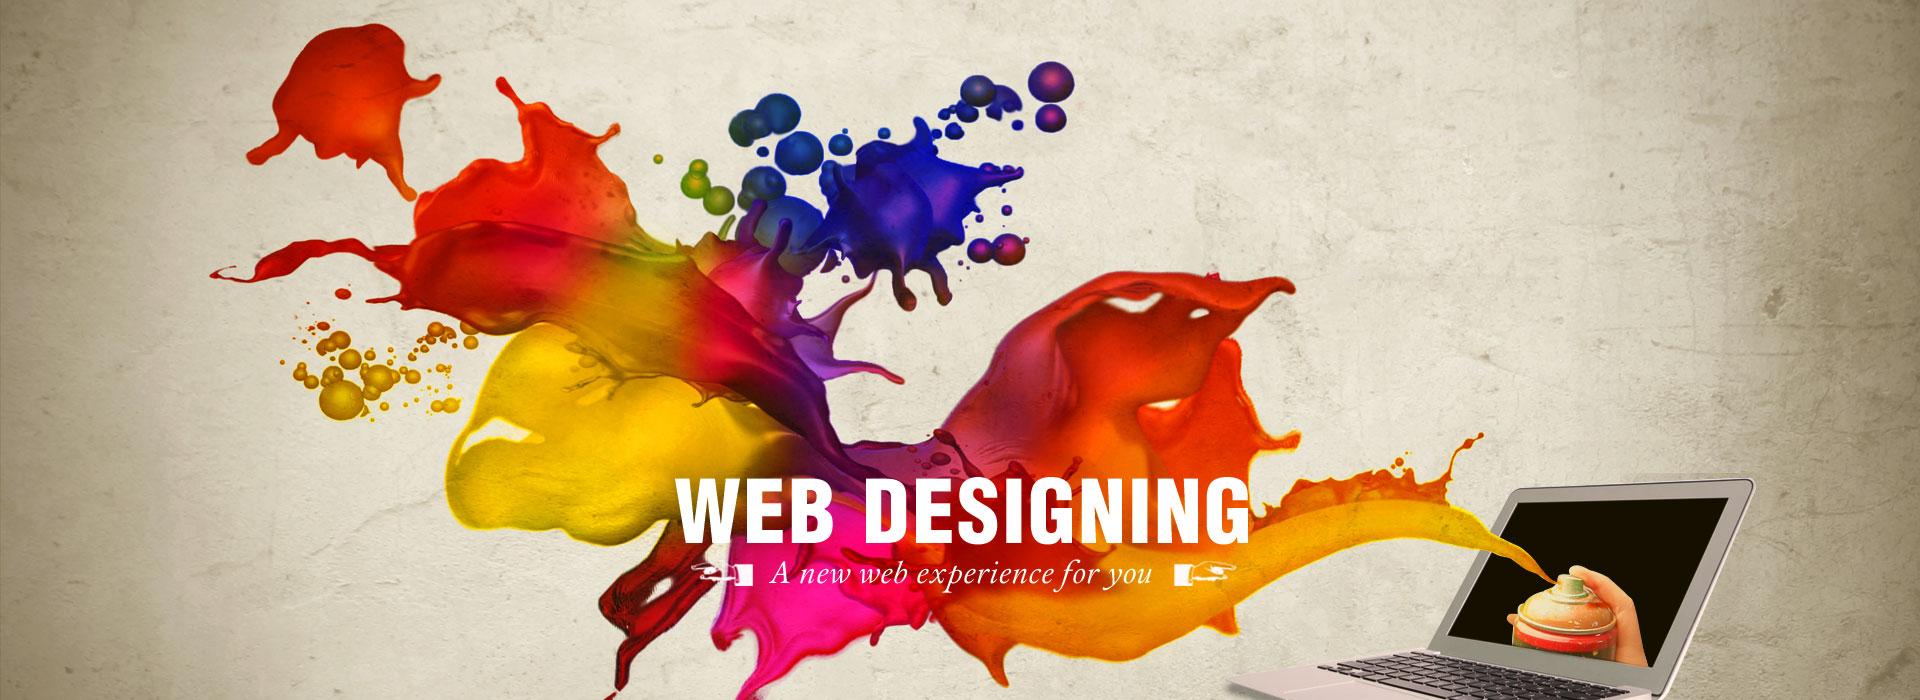 LM SOFTECH Web development & designing company bareilly software  development and seo company